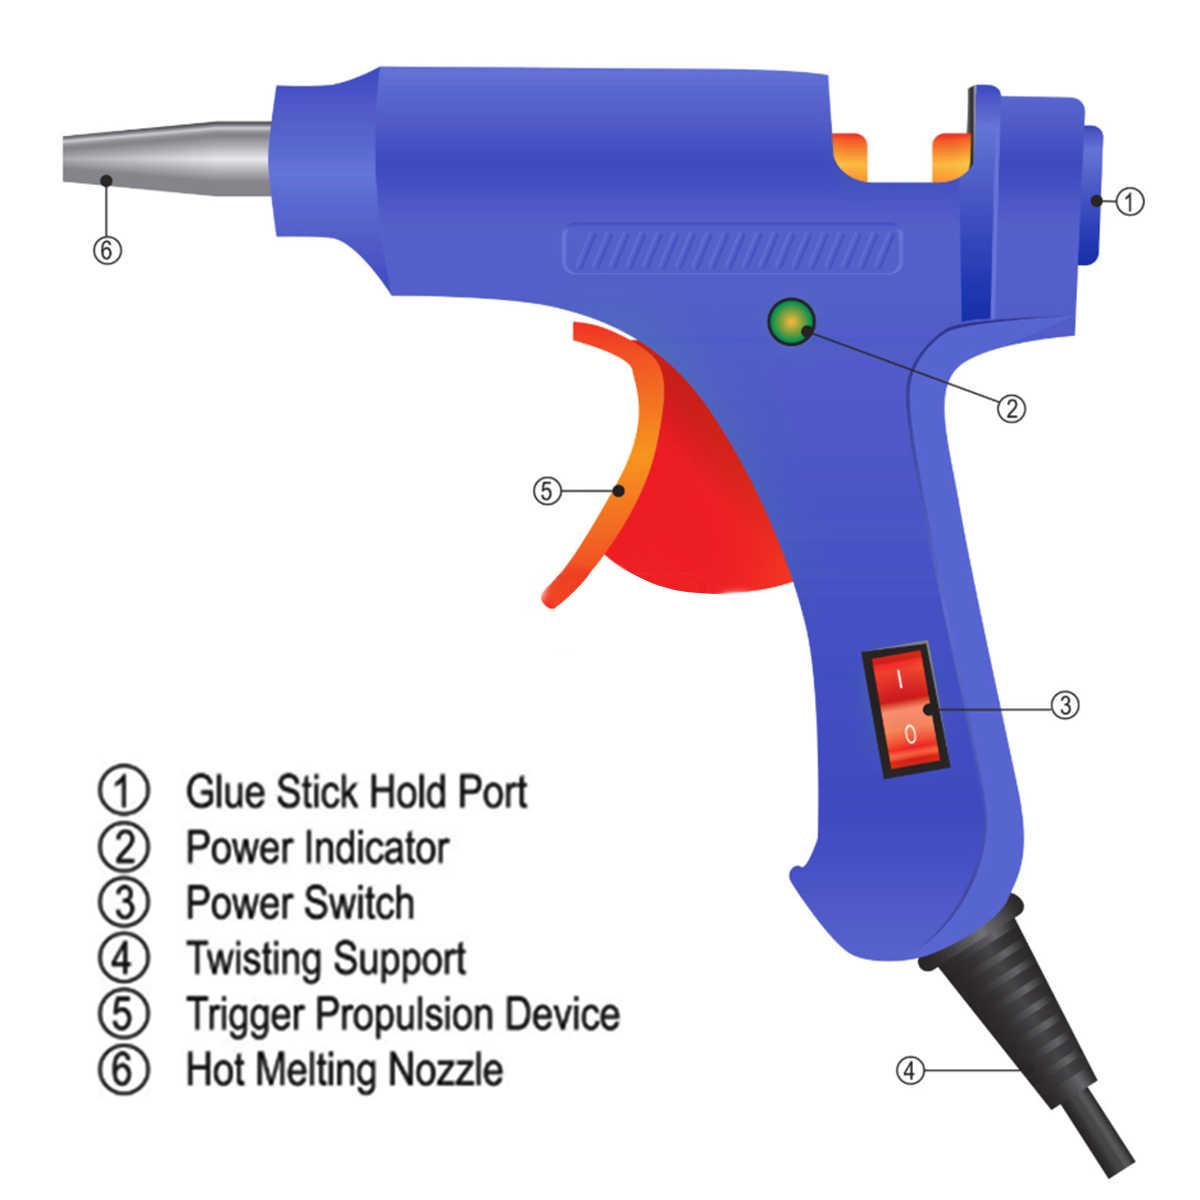 20W Hot Melt กาวปืน 30pcs 7 มม.* 200 มม.กาว Stick อุตสาหกรรมมินิปืน Thermo ไฟฟ้าเครื่องมือ Z50